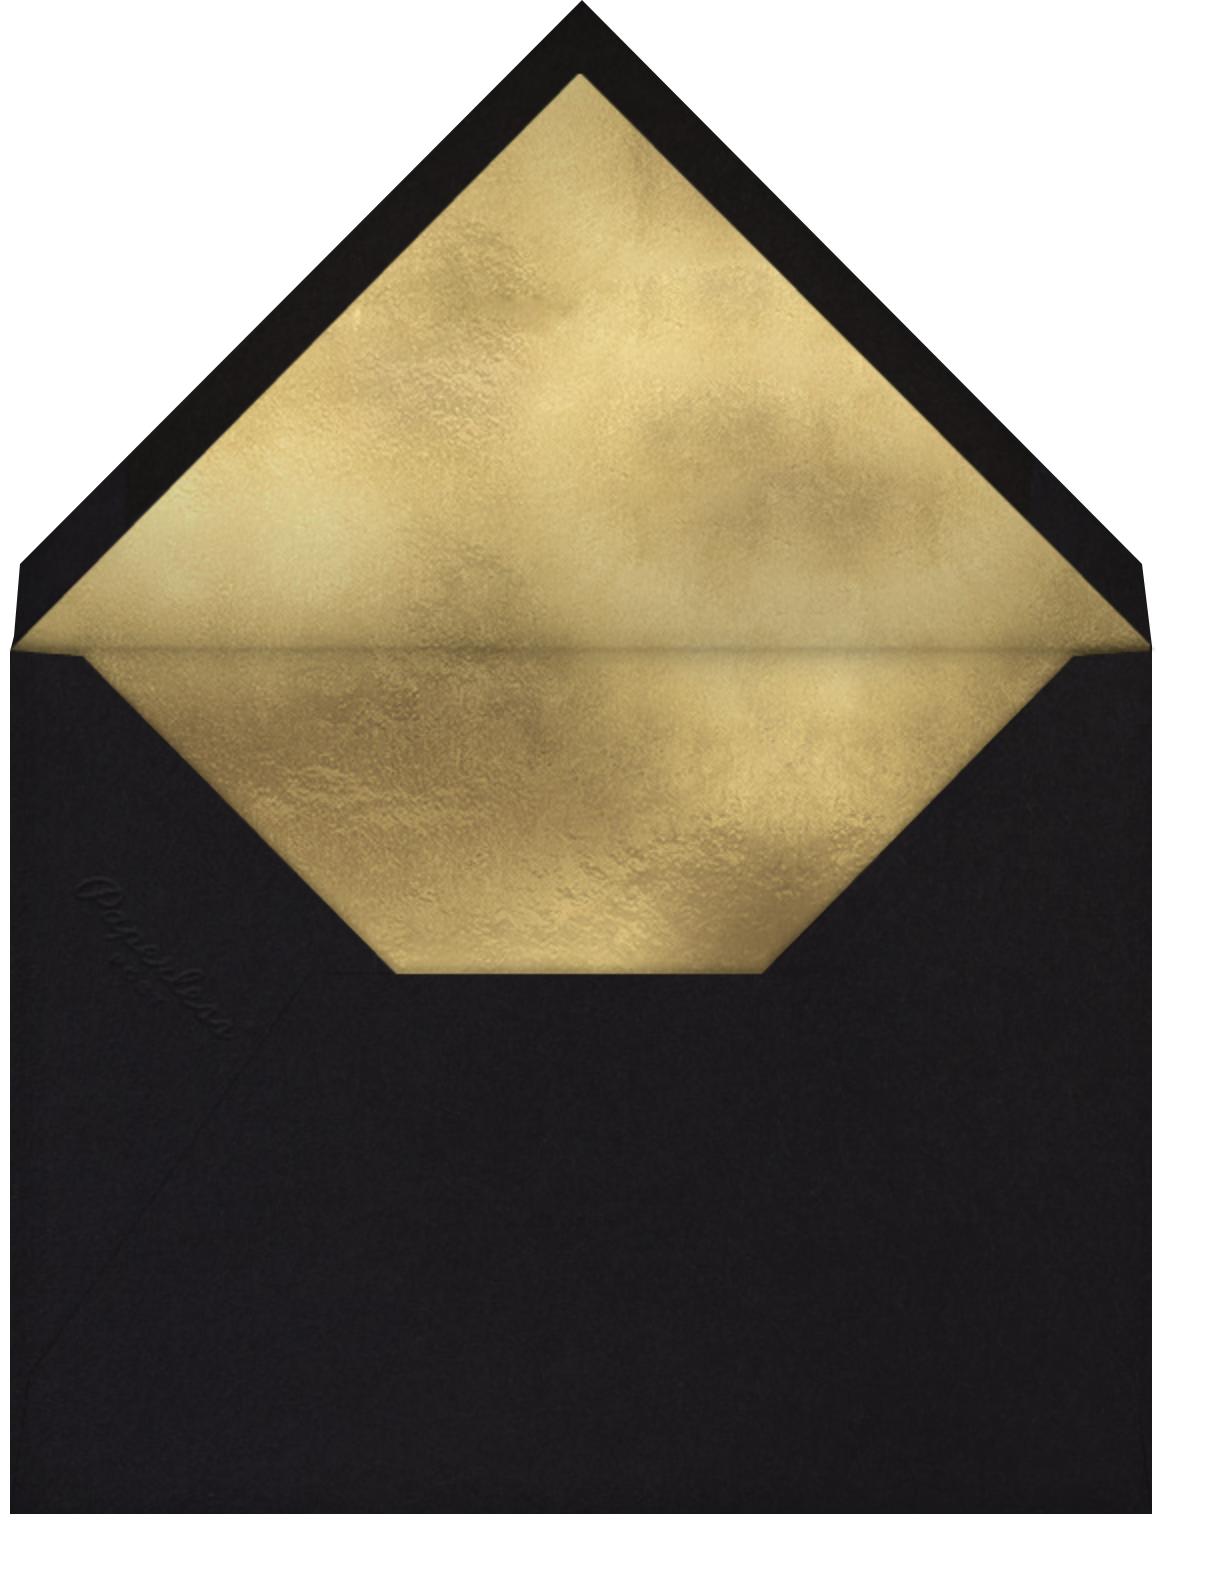 Fizzy - Black - Mr. Boddington's Studio - New Year's Eve - envelope back